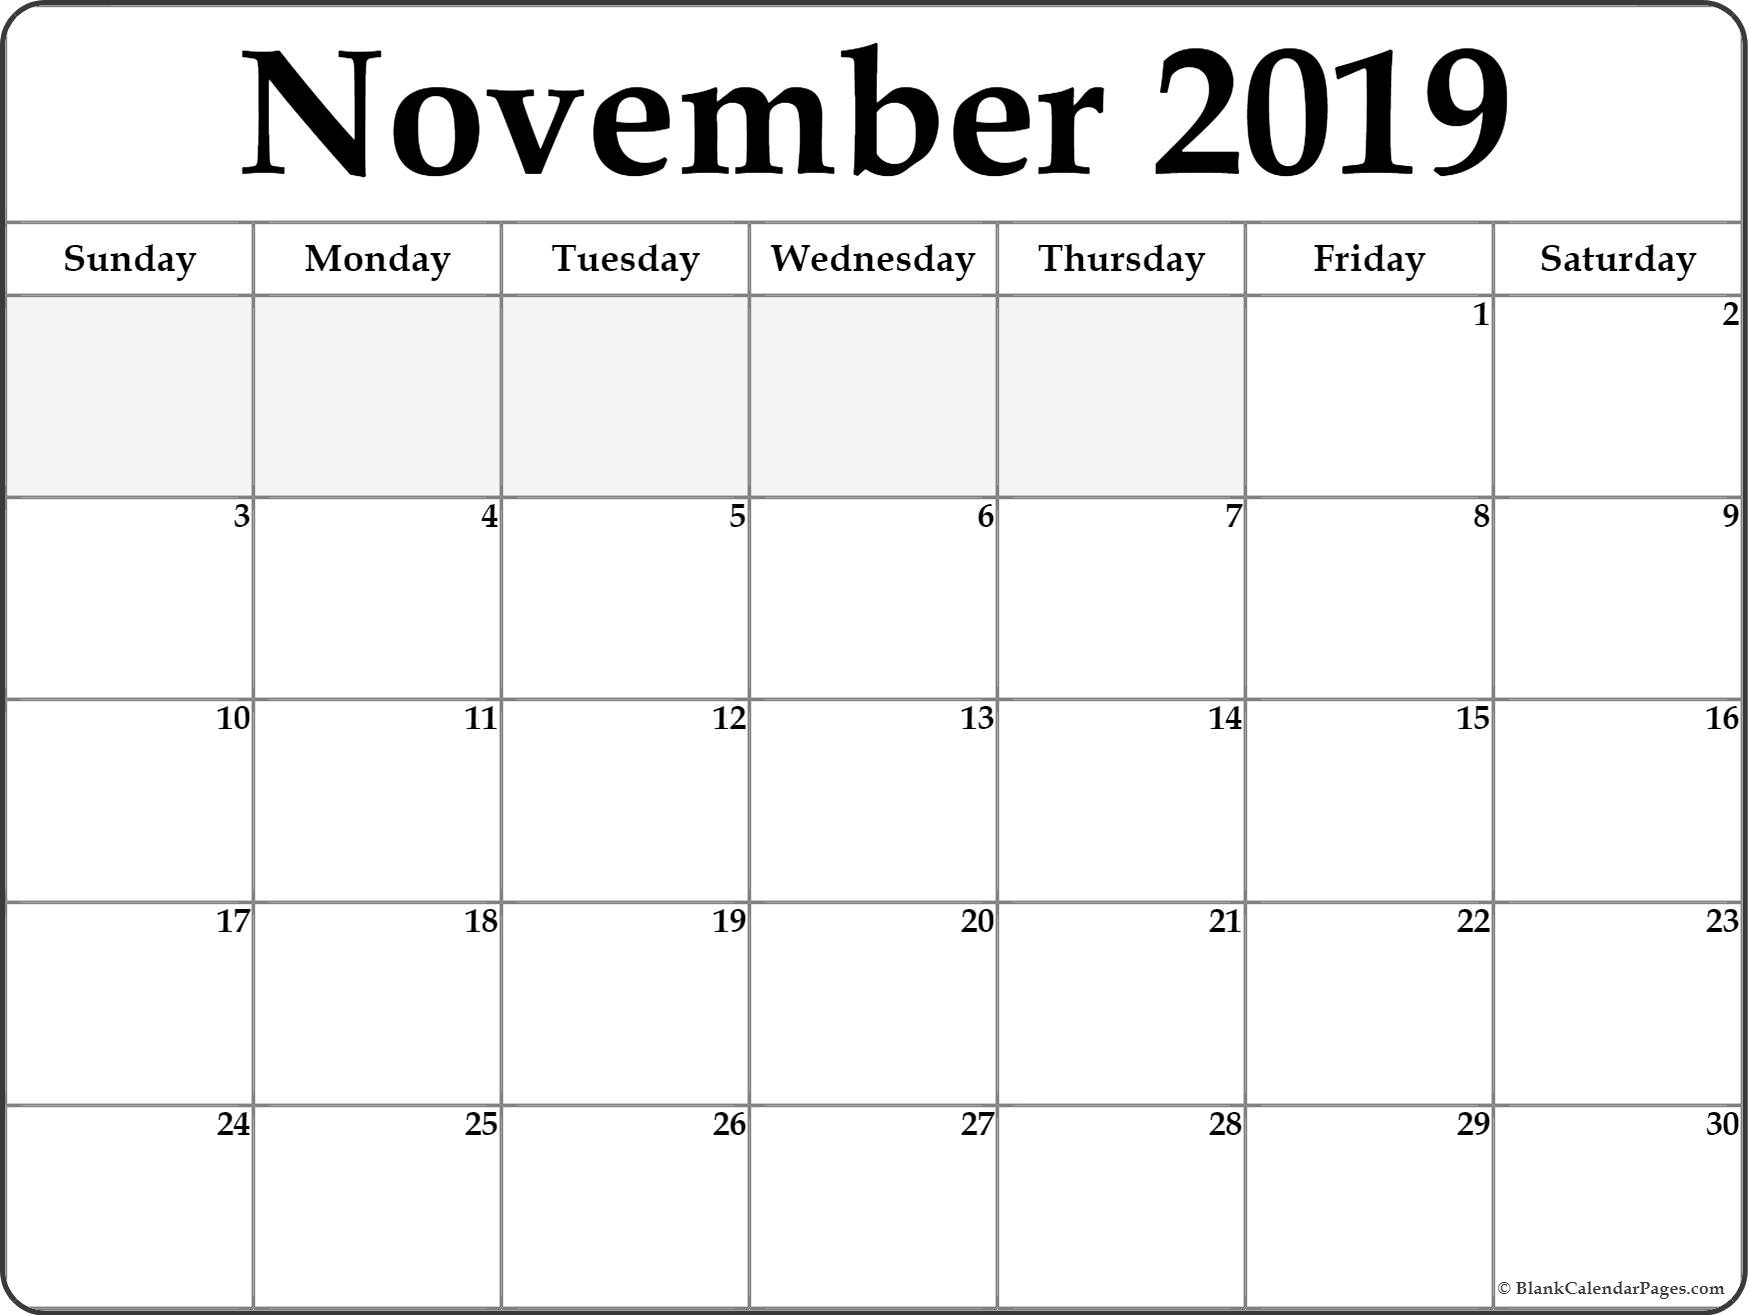 Editable November 2019 Printable Calendar - Word, Pdf, Excel